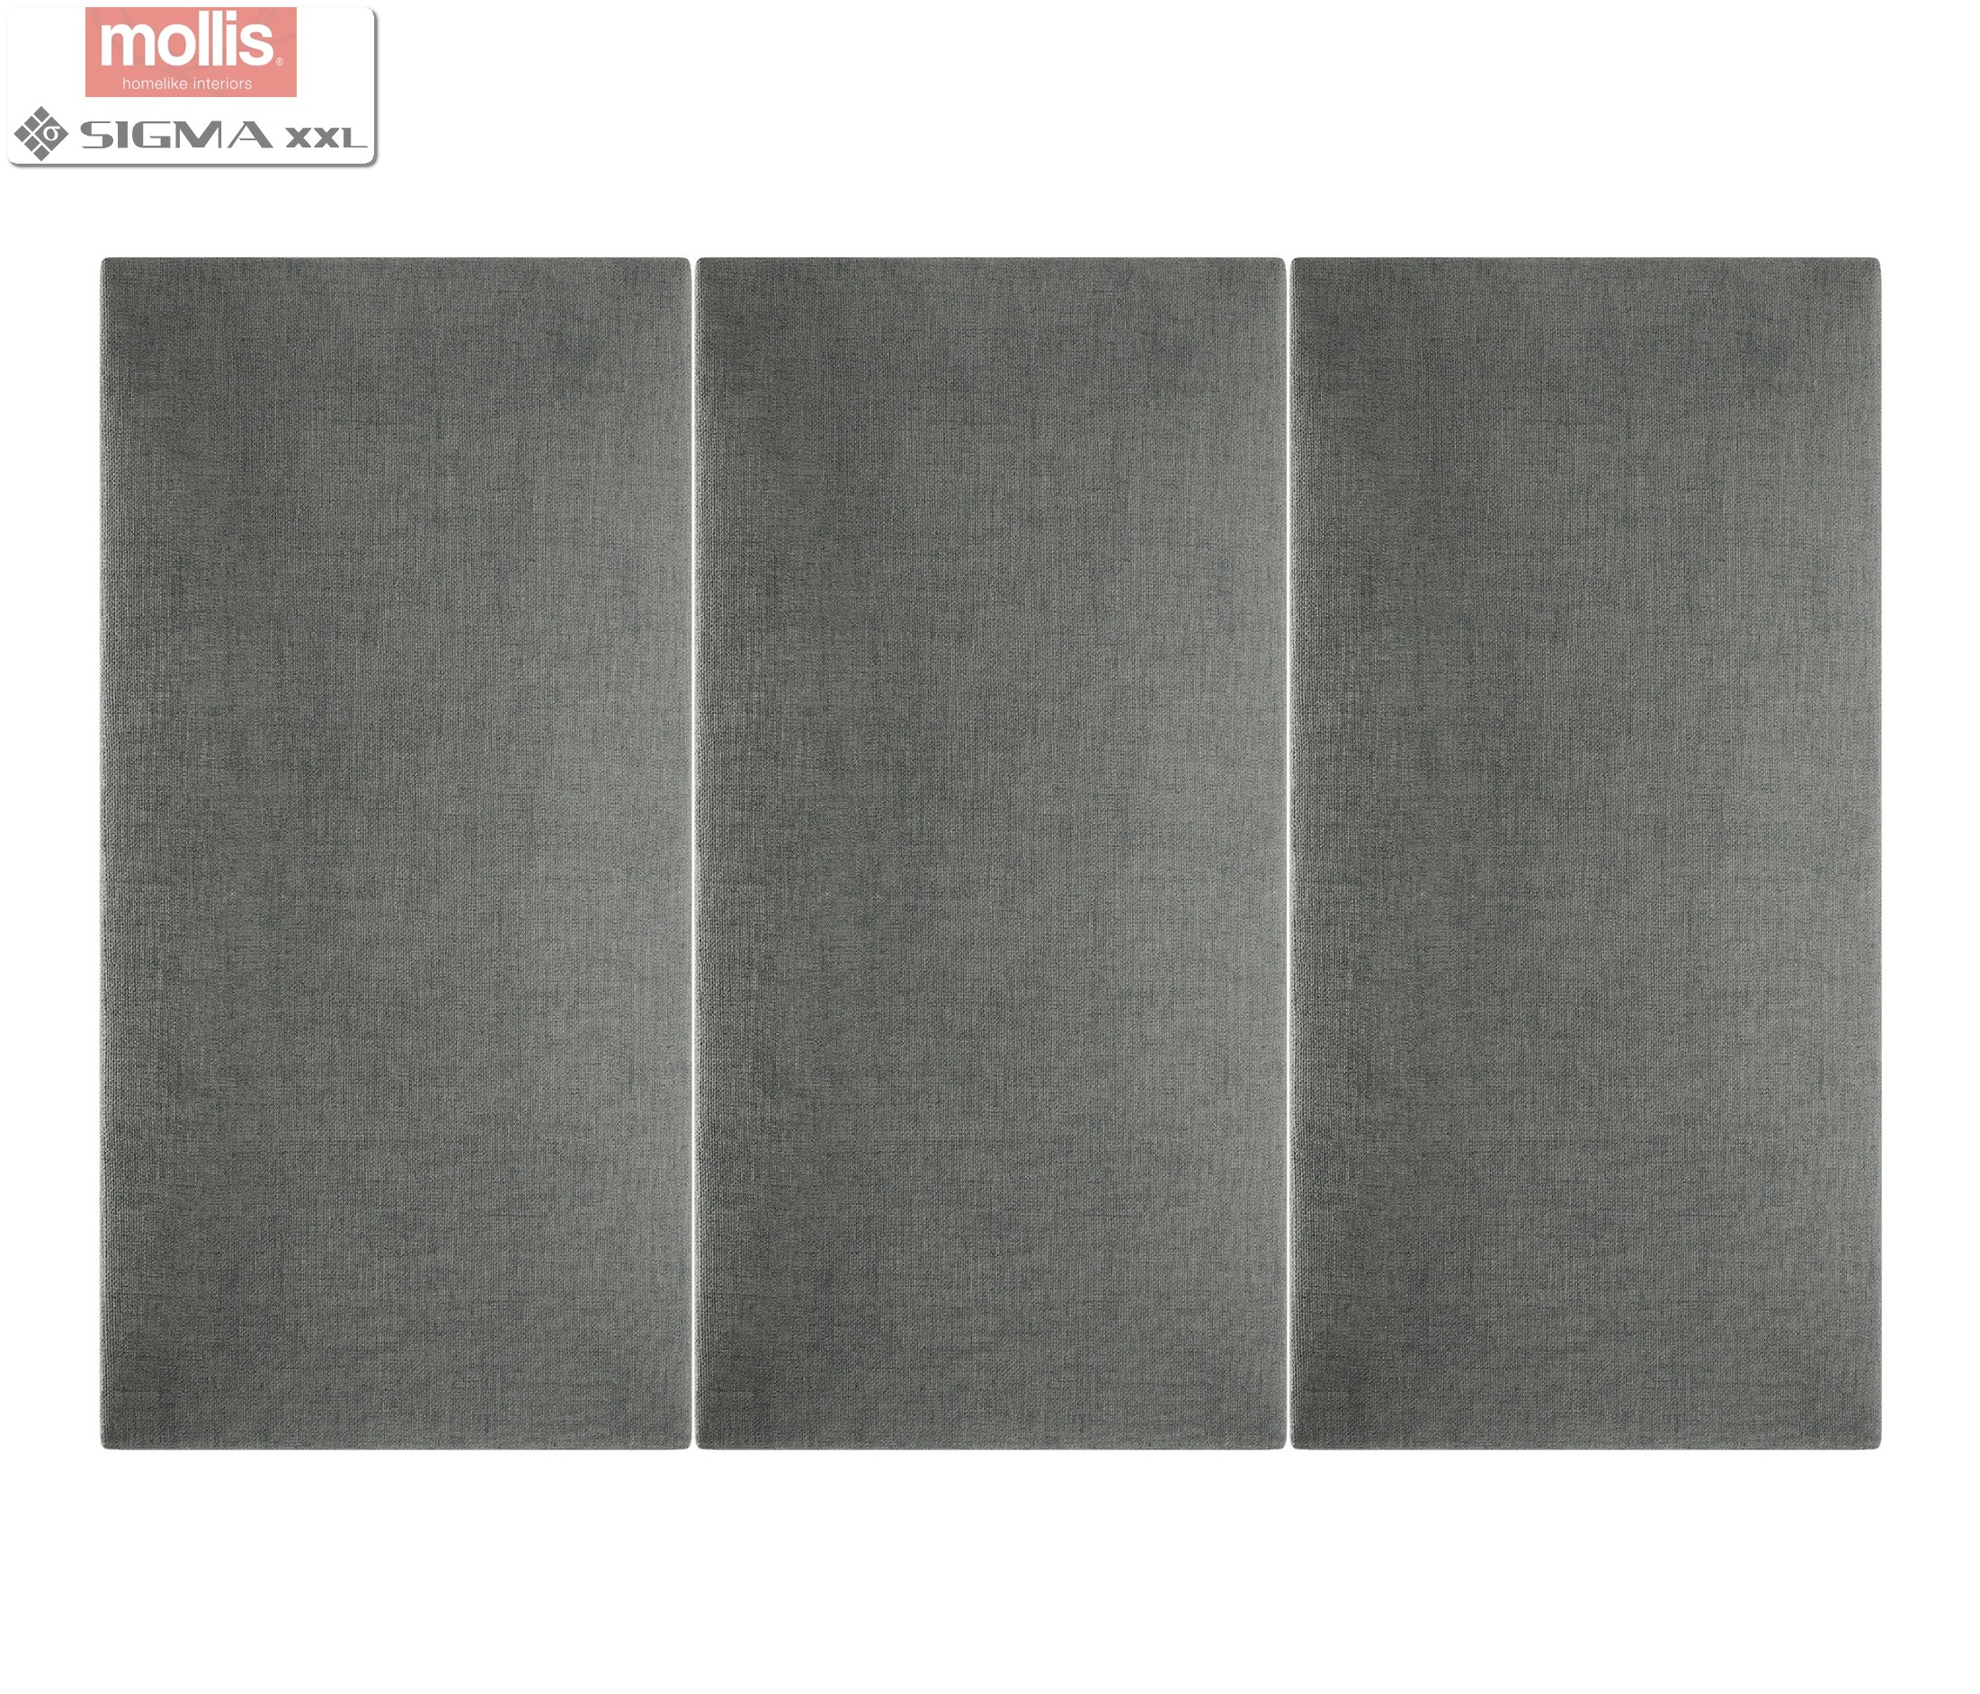 Imagine Mollis Basic 01 Antracit (Dreptunghi- 30x60 cm)